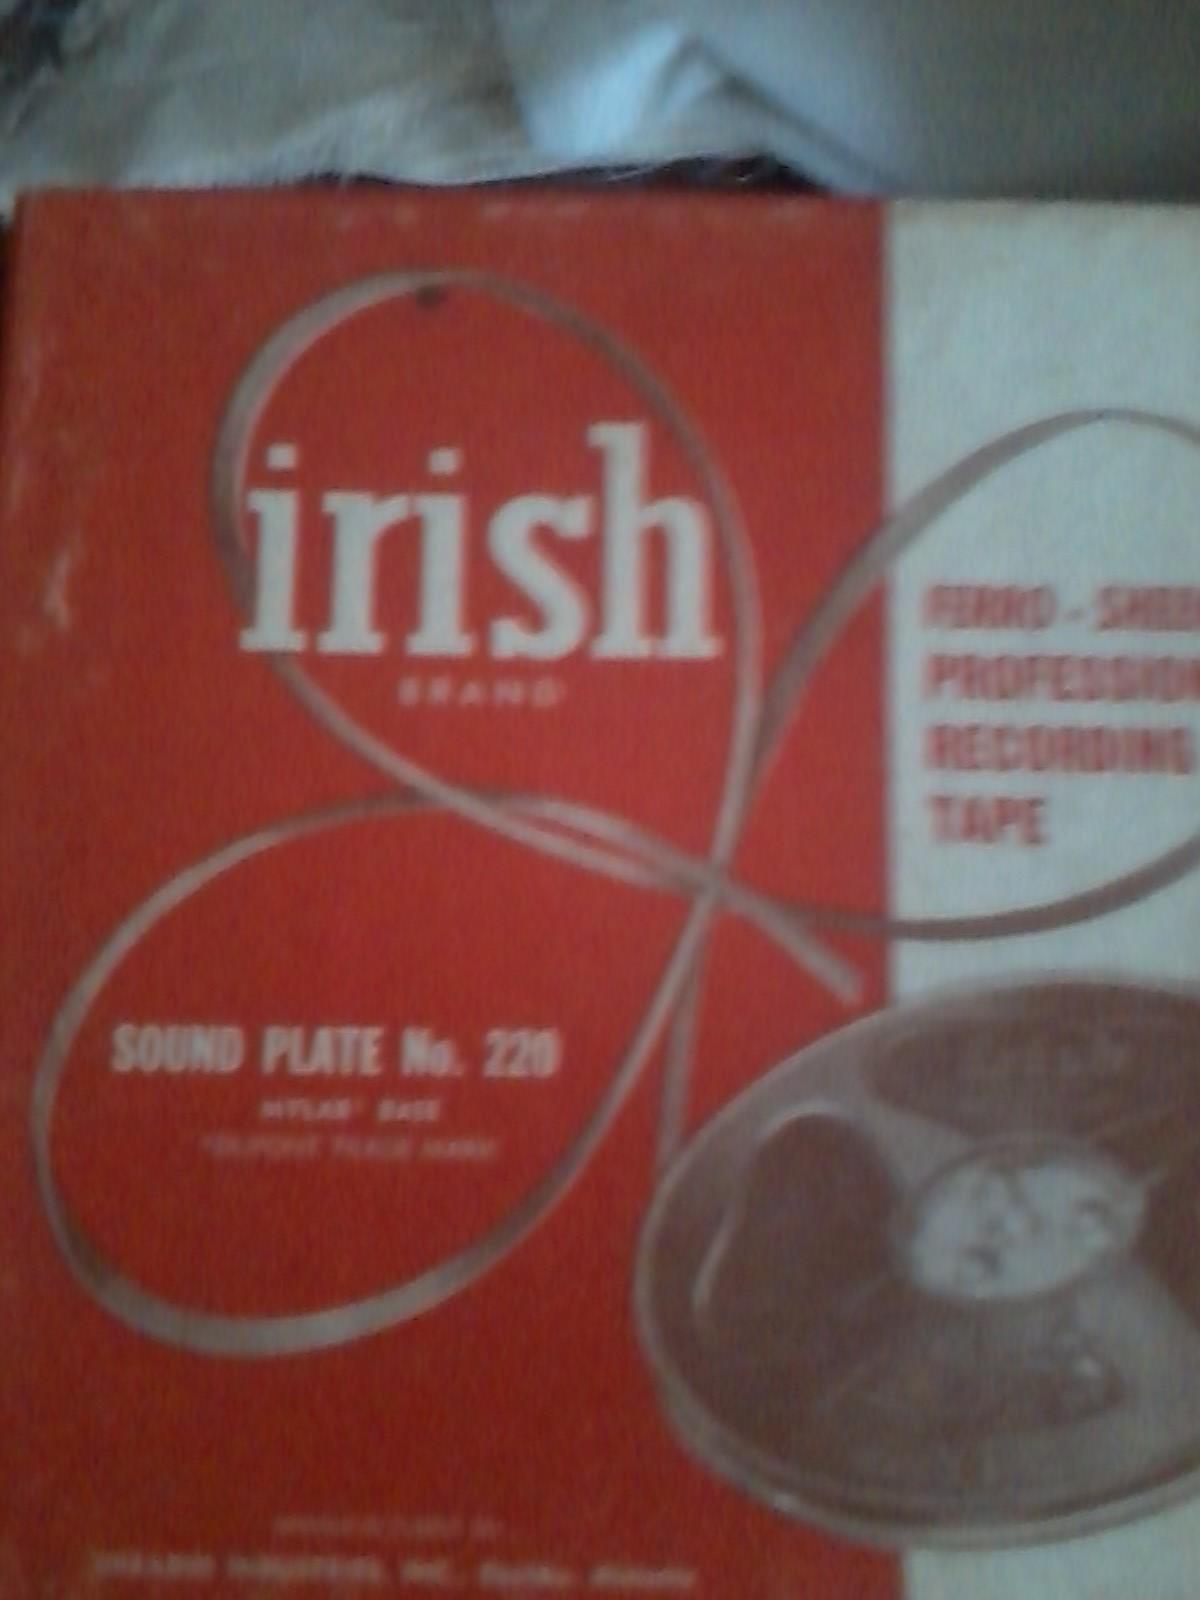 Irish Brand Sound Plate